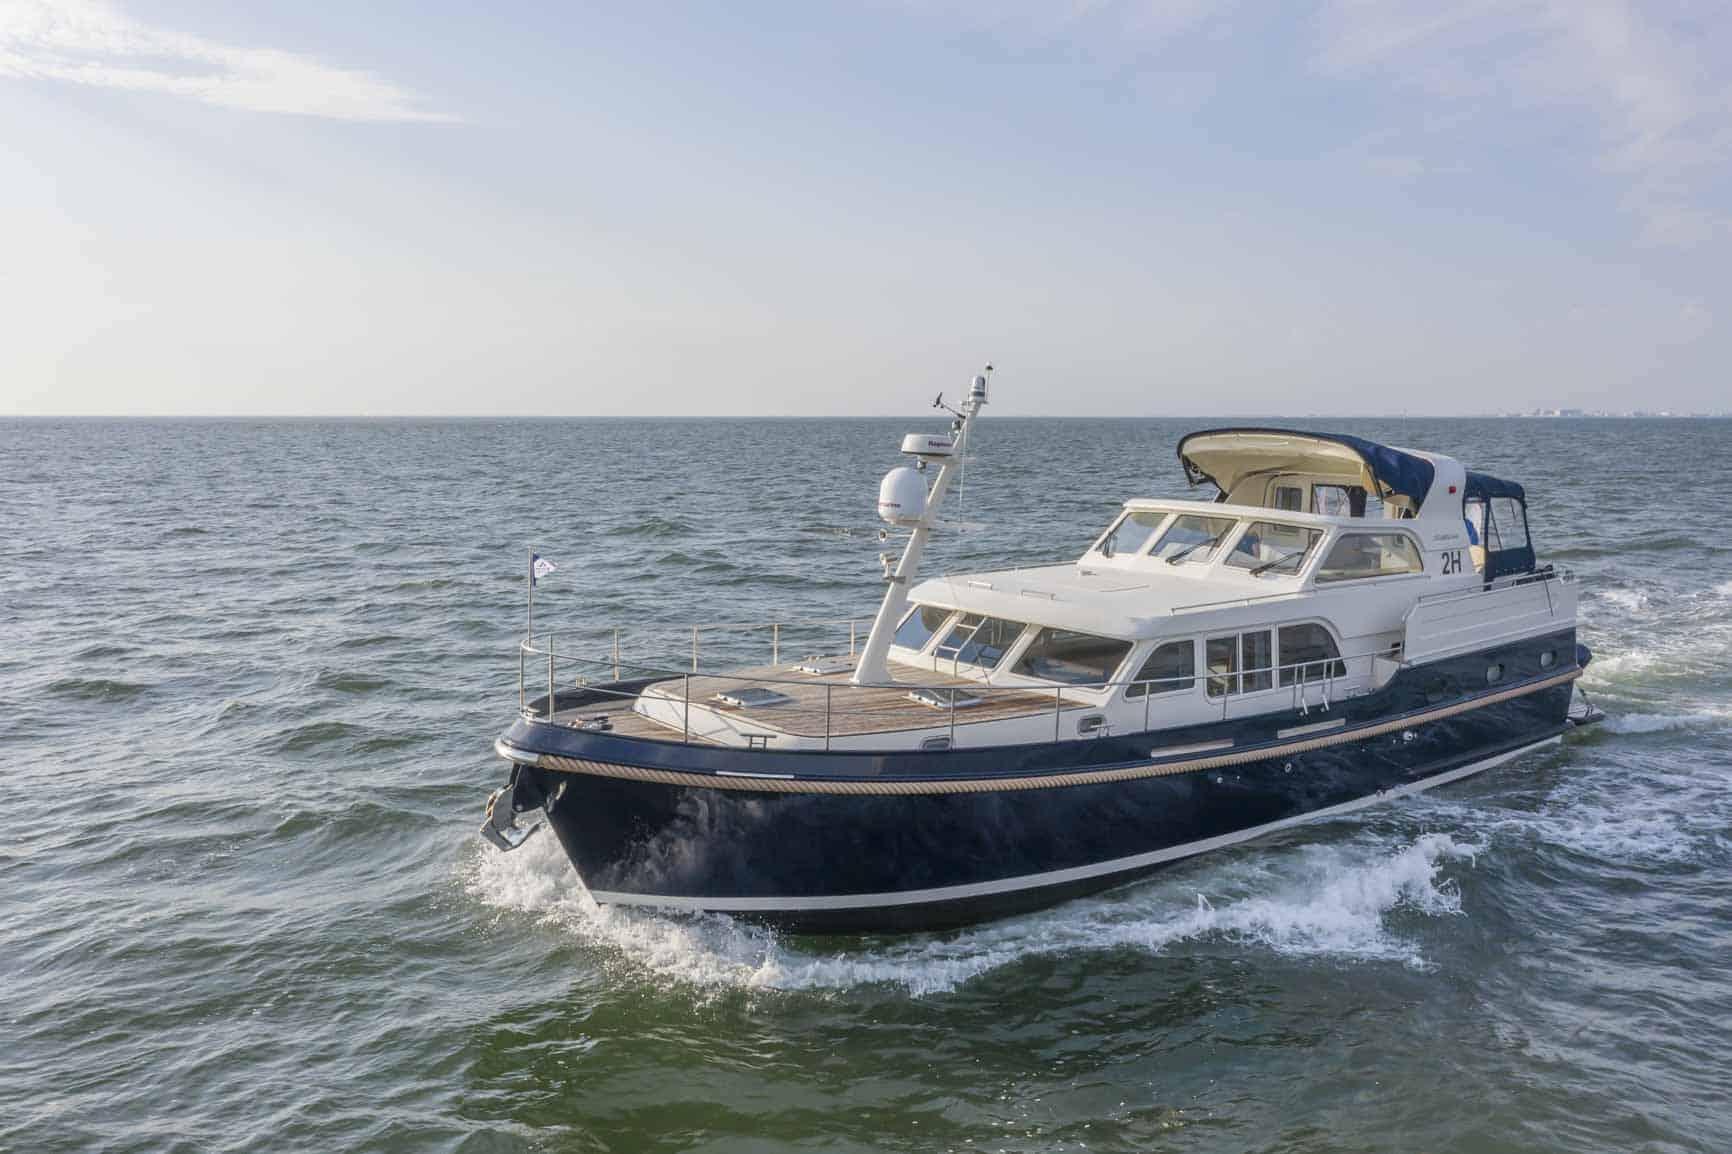 linssen-grand-sturdy-500-acvt-bnr3329-20200916-0893